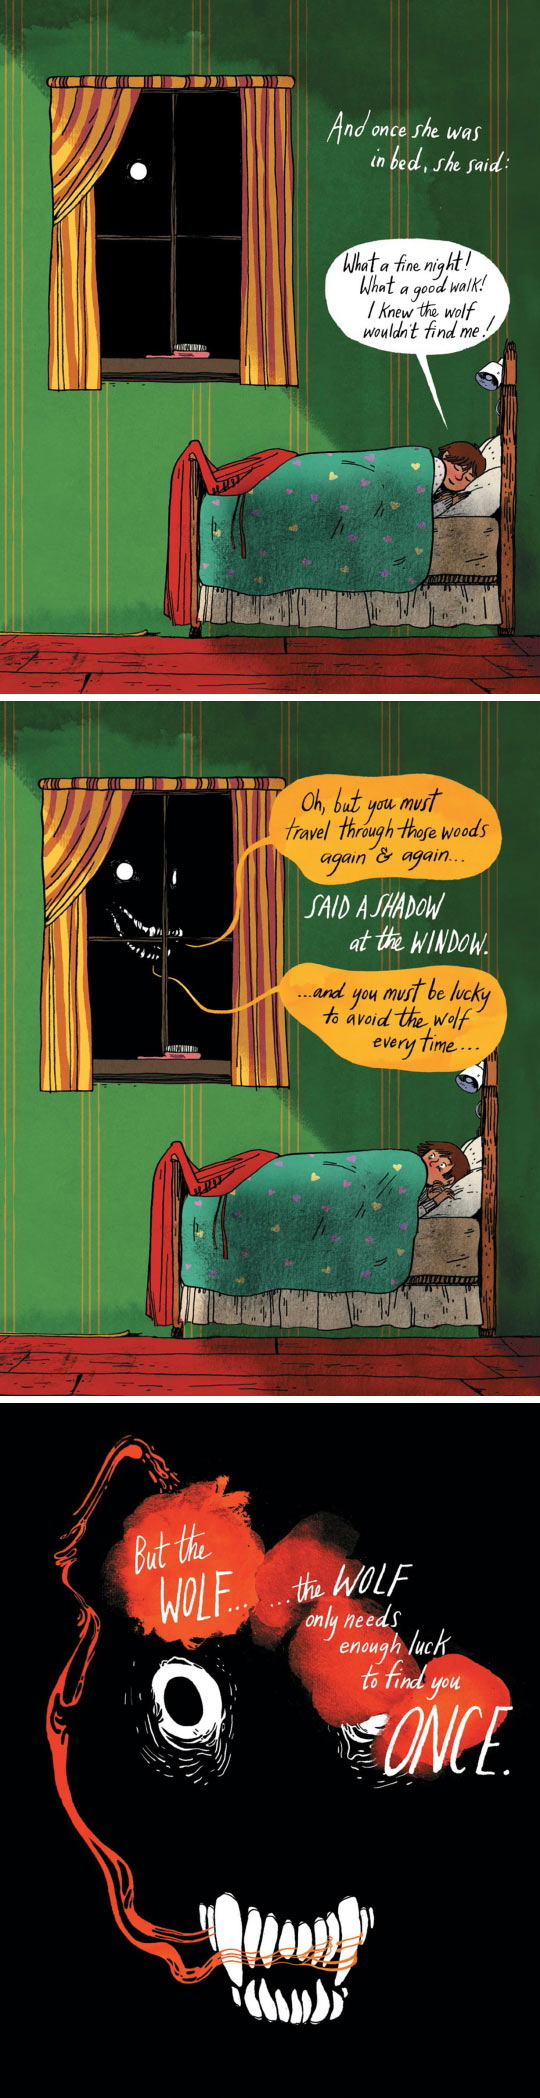 comic-girl-sleeping-night